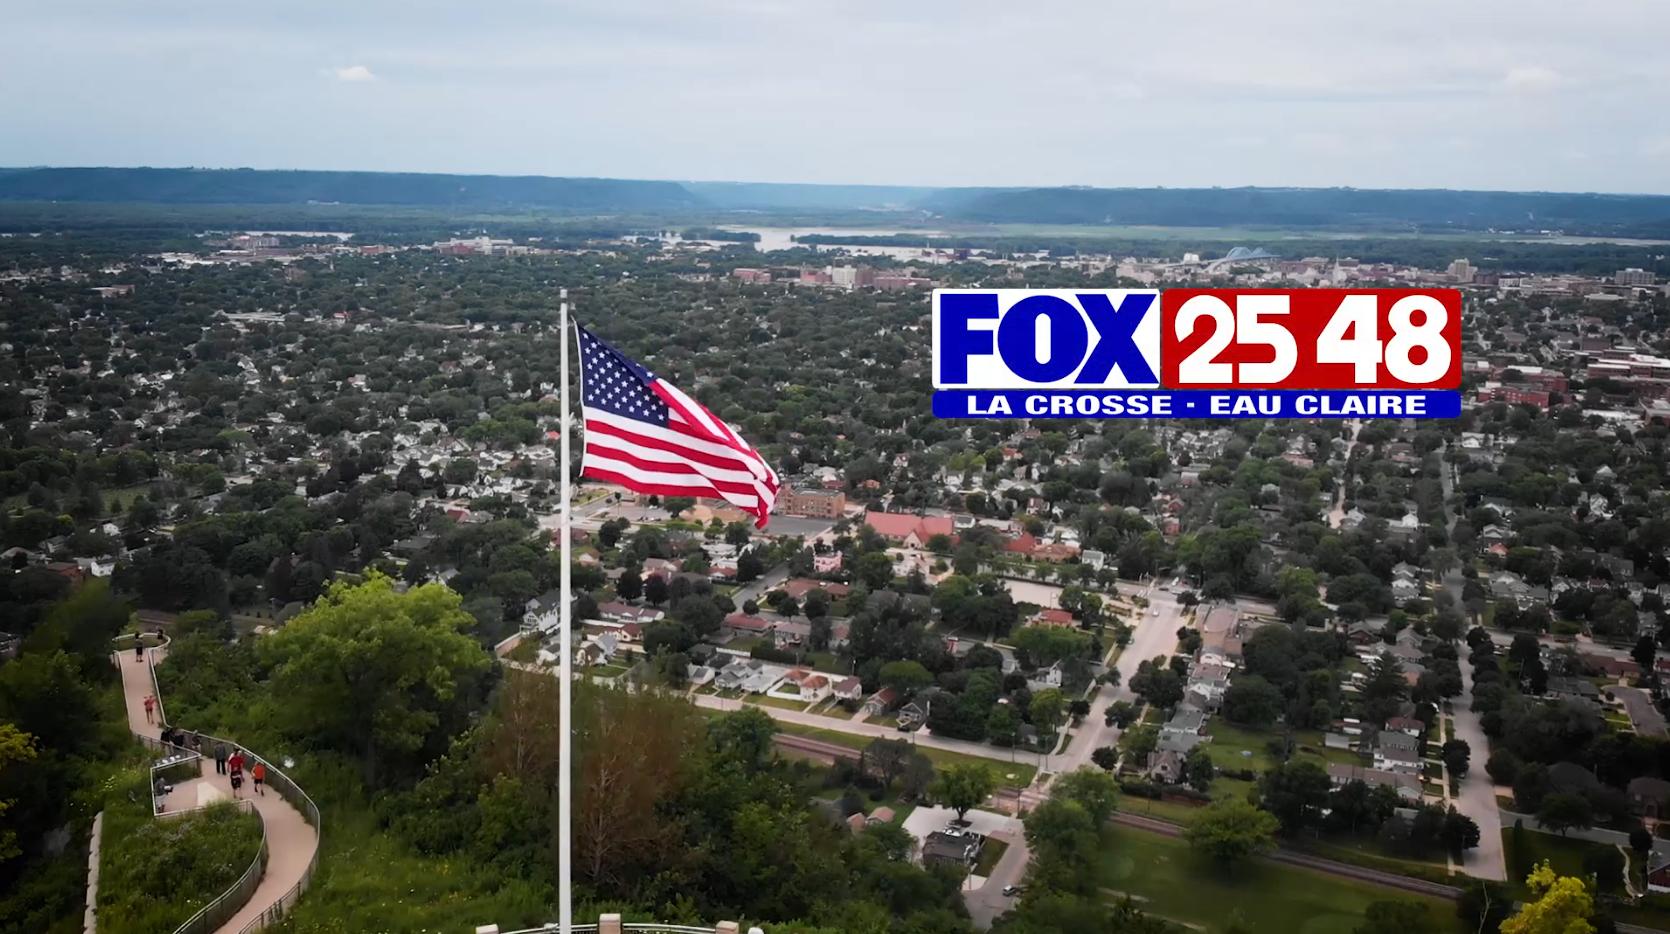 FOX 2548 & WIProud | La Crosse & Eau Claire News, Weather, & Sports